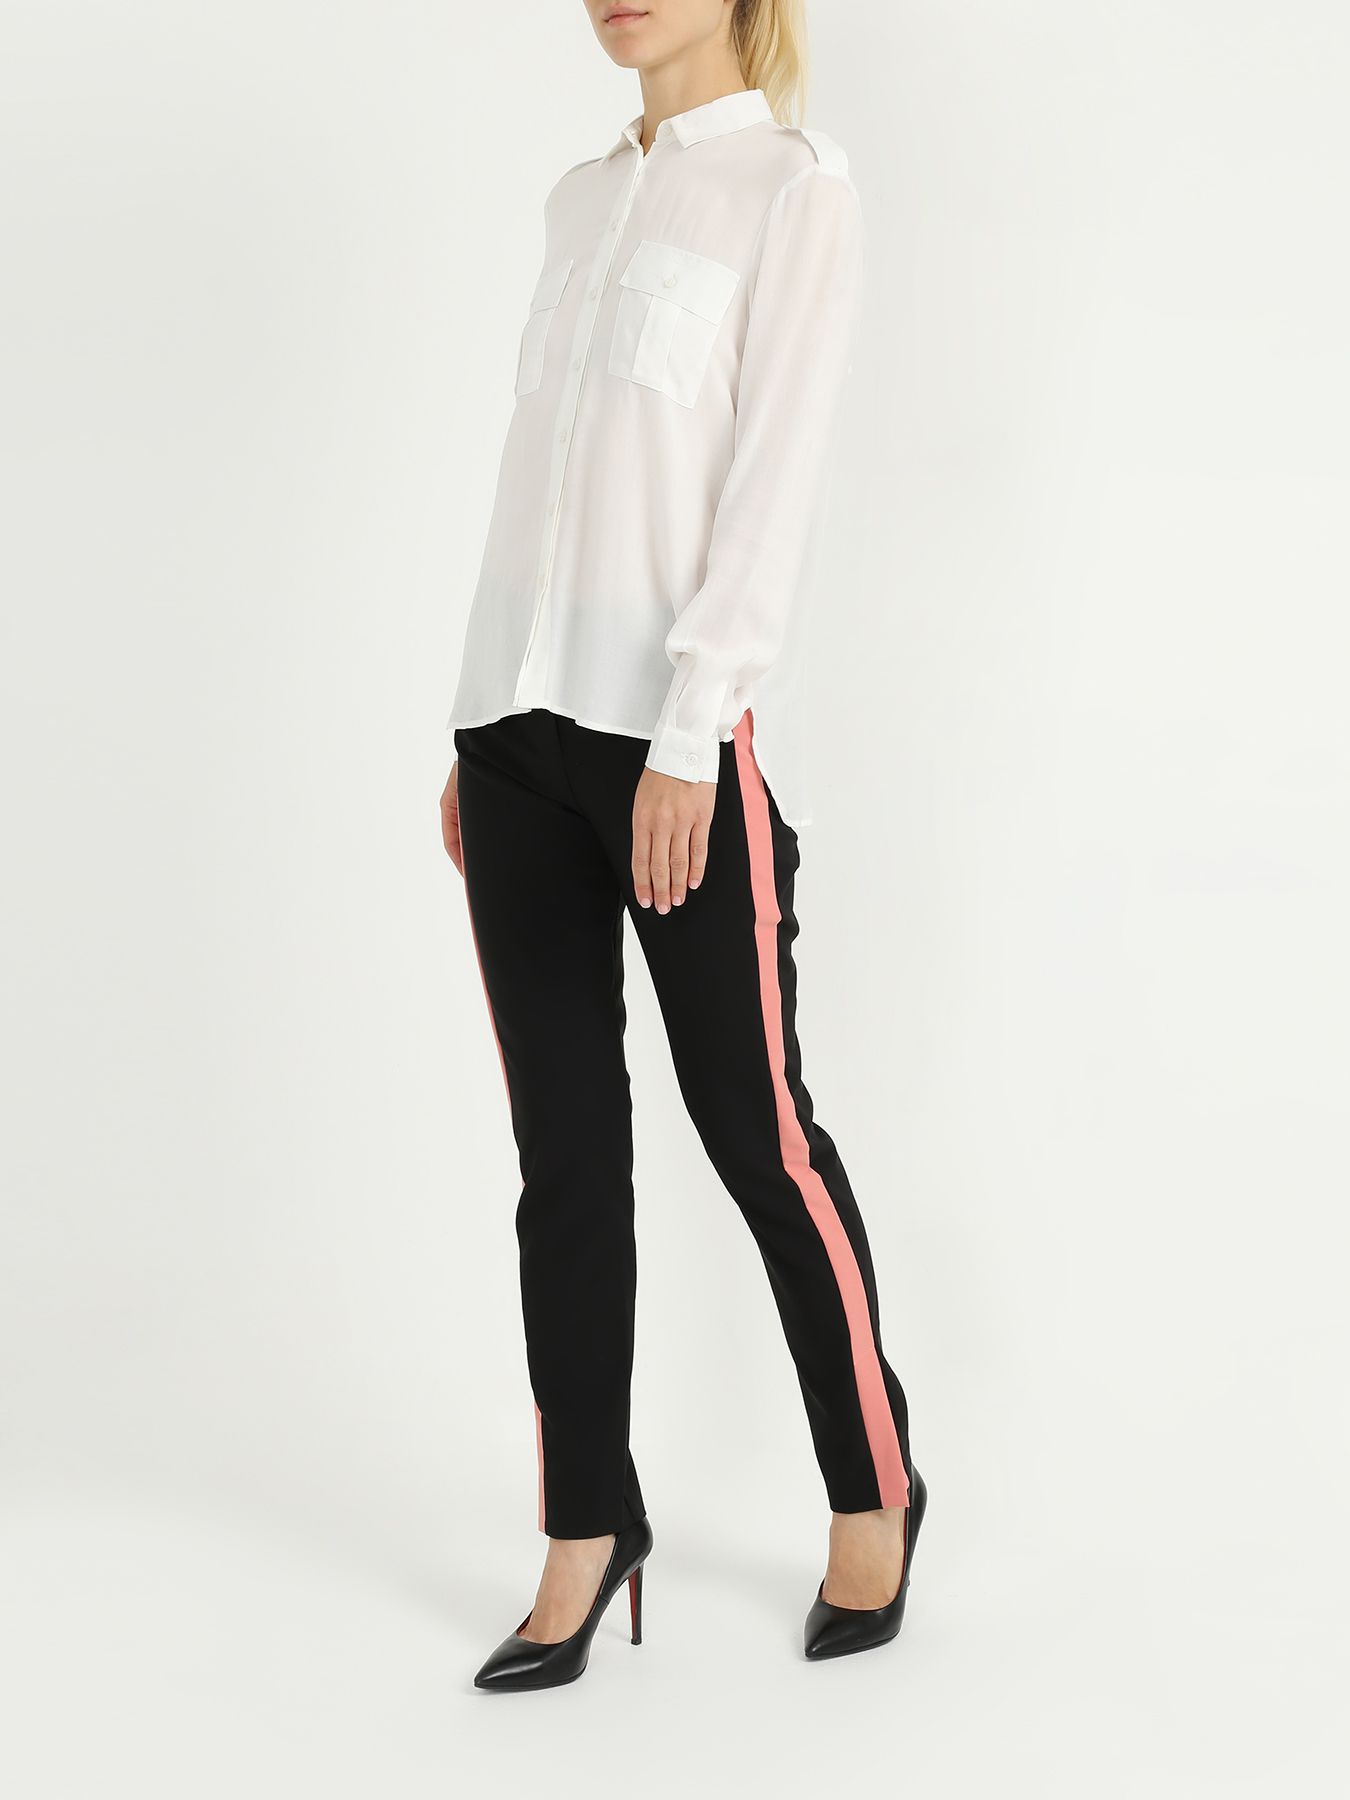 Брюки Armani Exchange Узкие брюки с полосками по бокам